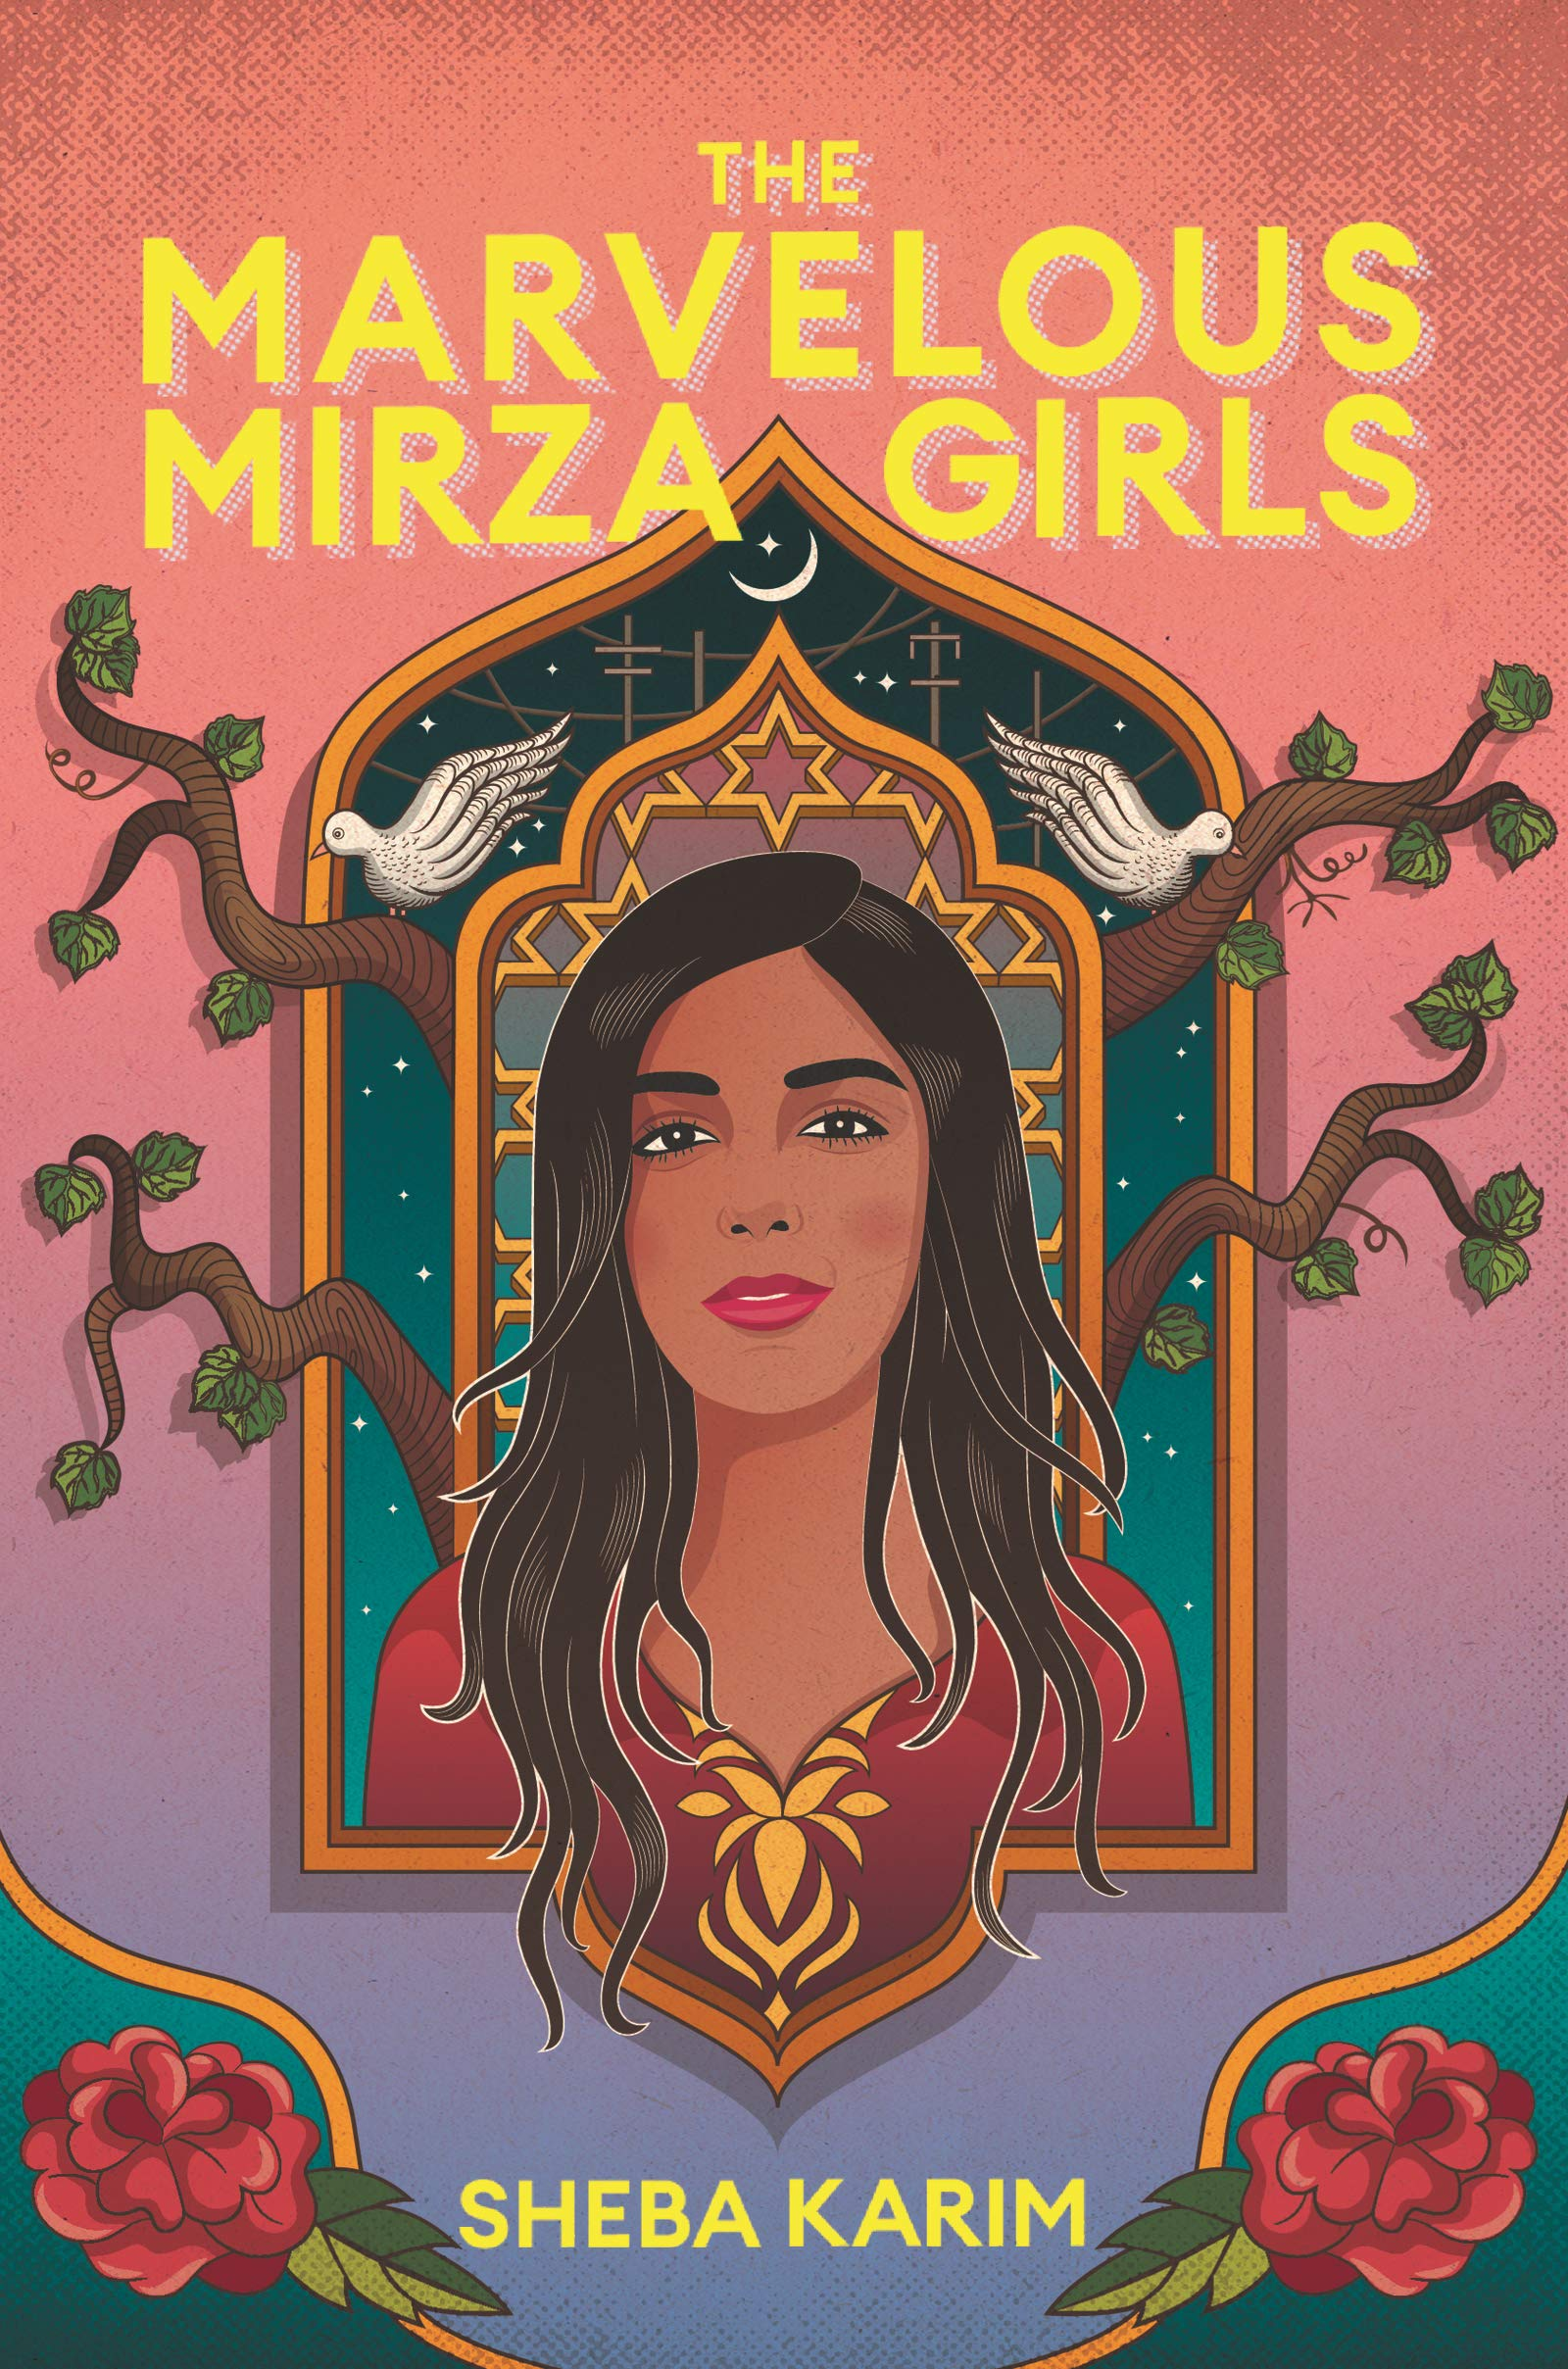 Amazon.com: The Marvelous Mirza Girls (9780062845481): Karim, Sheba: Books